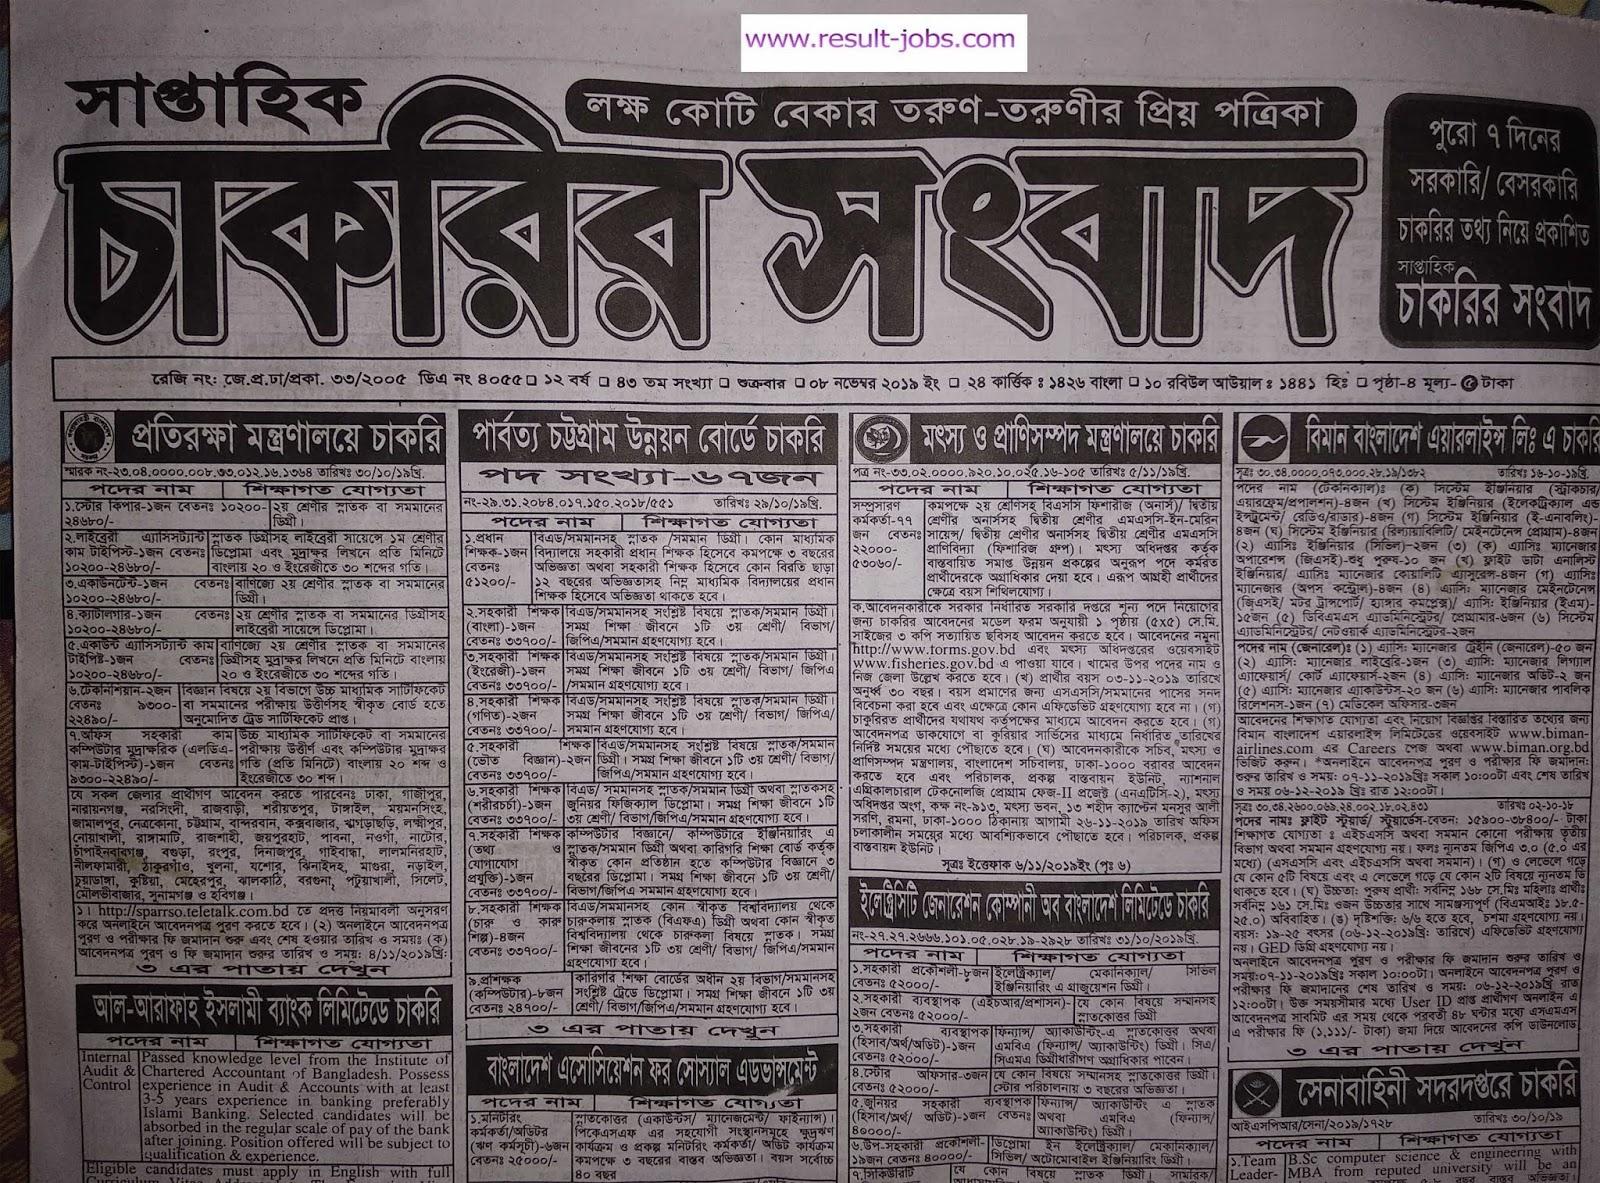 weekly-chakrir-khobor-bangla-newspaper-www.result-jobs.com8